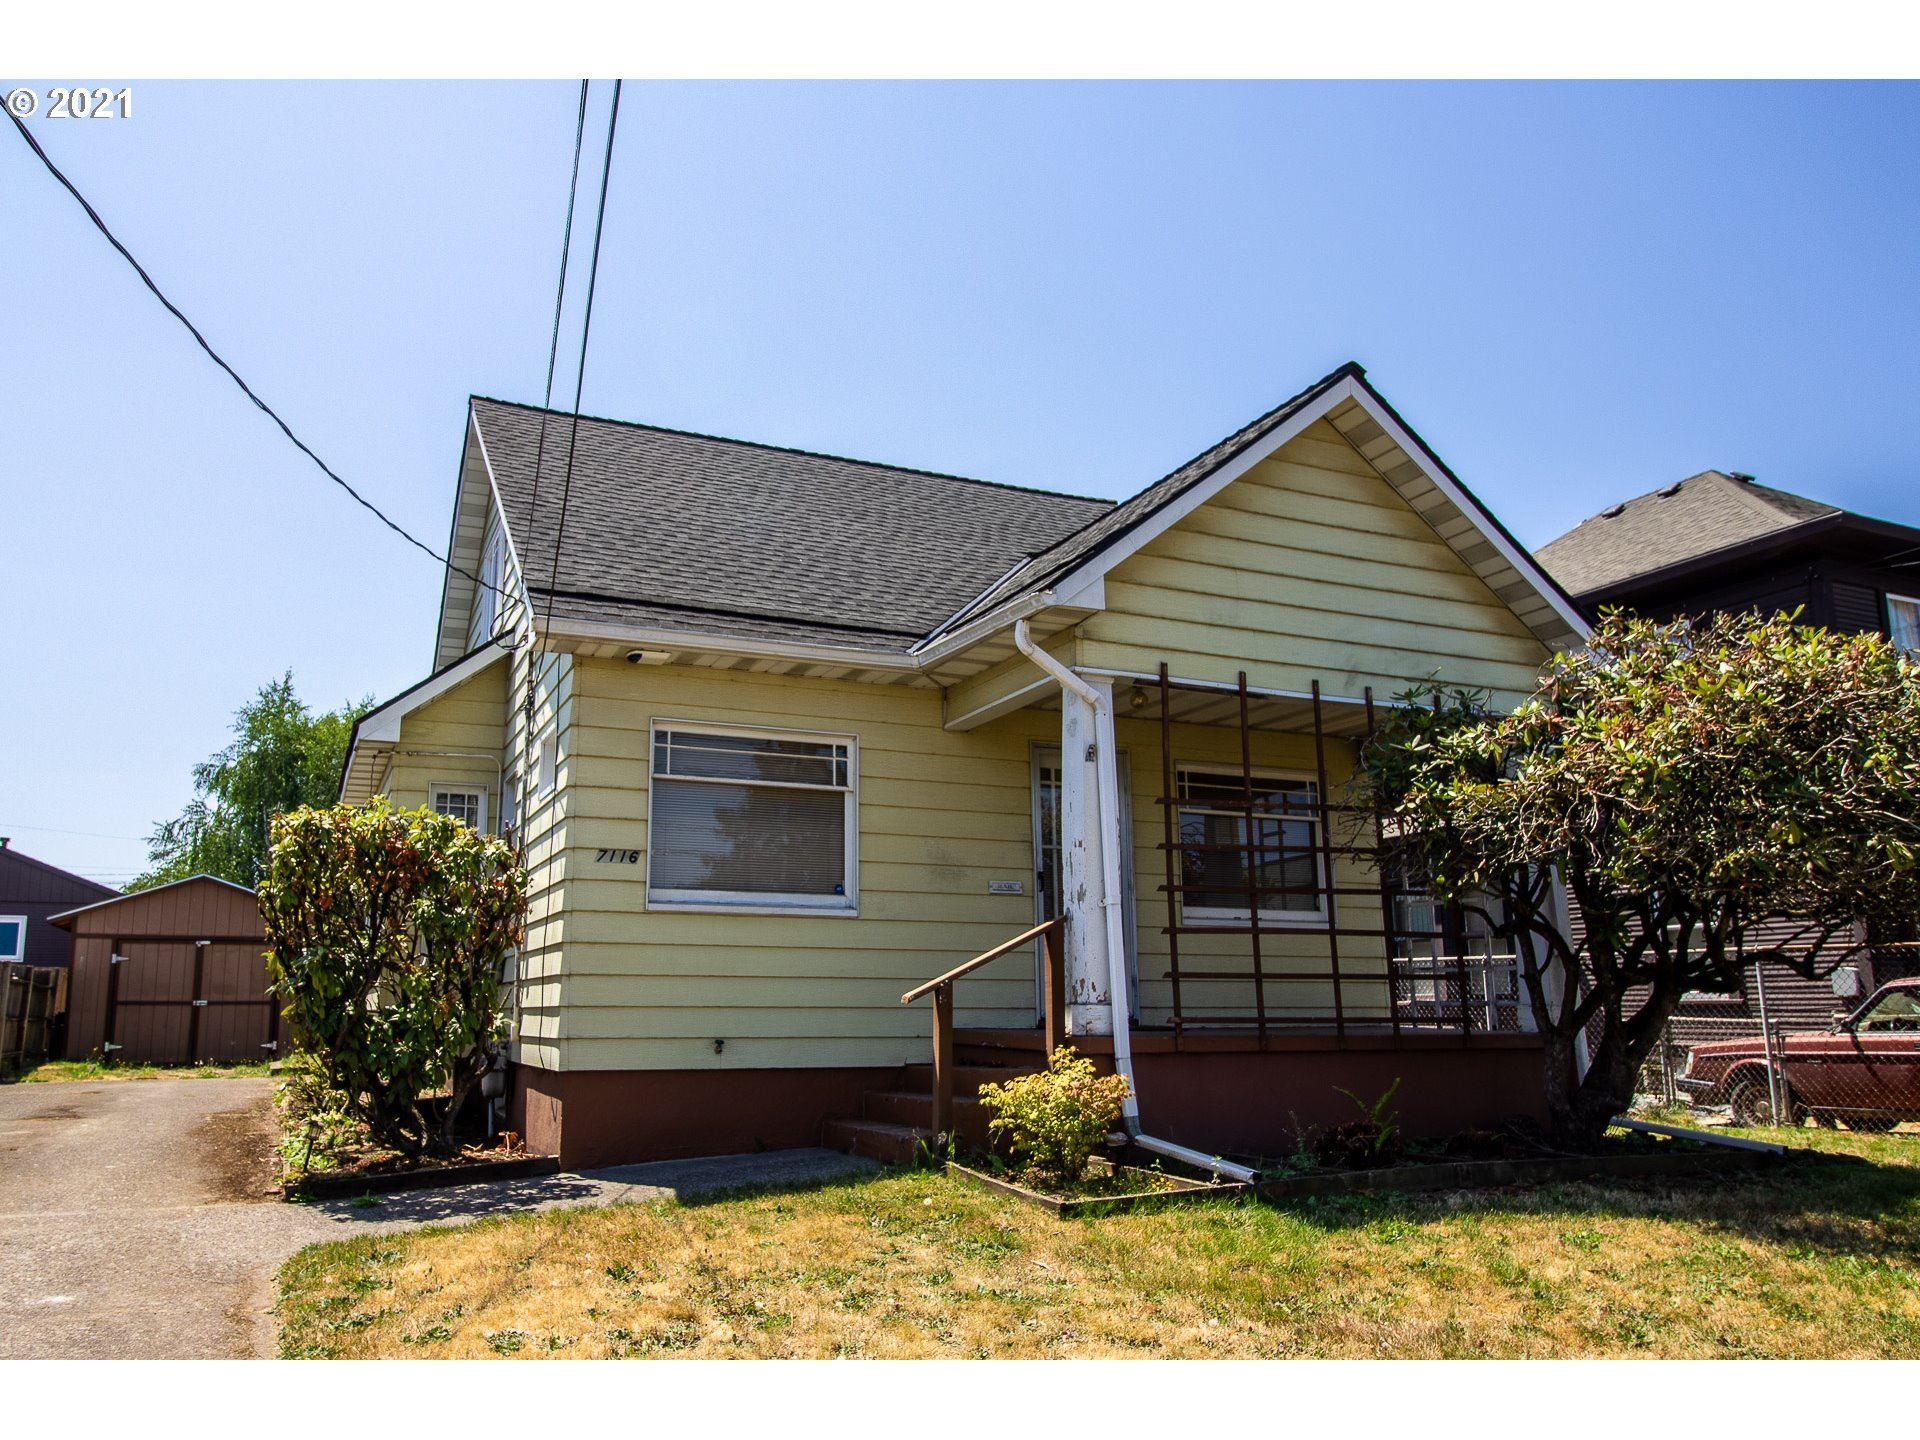 7116 N LOMBARD ST, Portland, OR 97203 - MLS#: 21005717